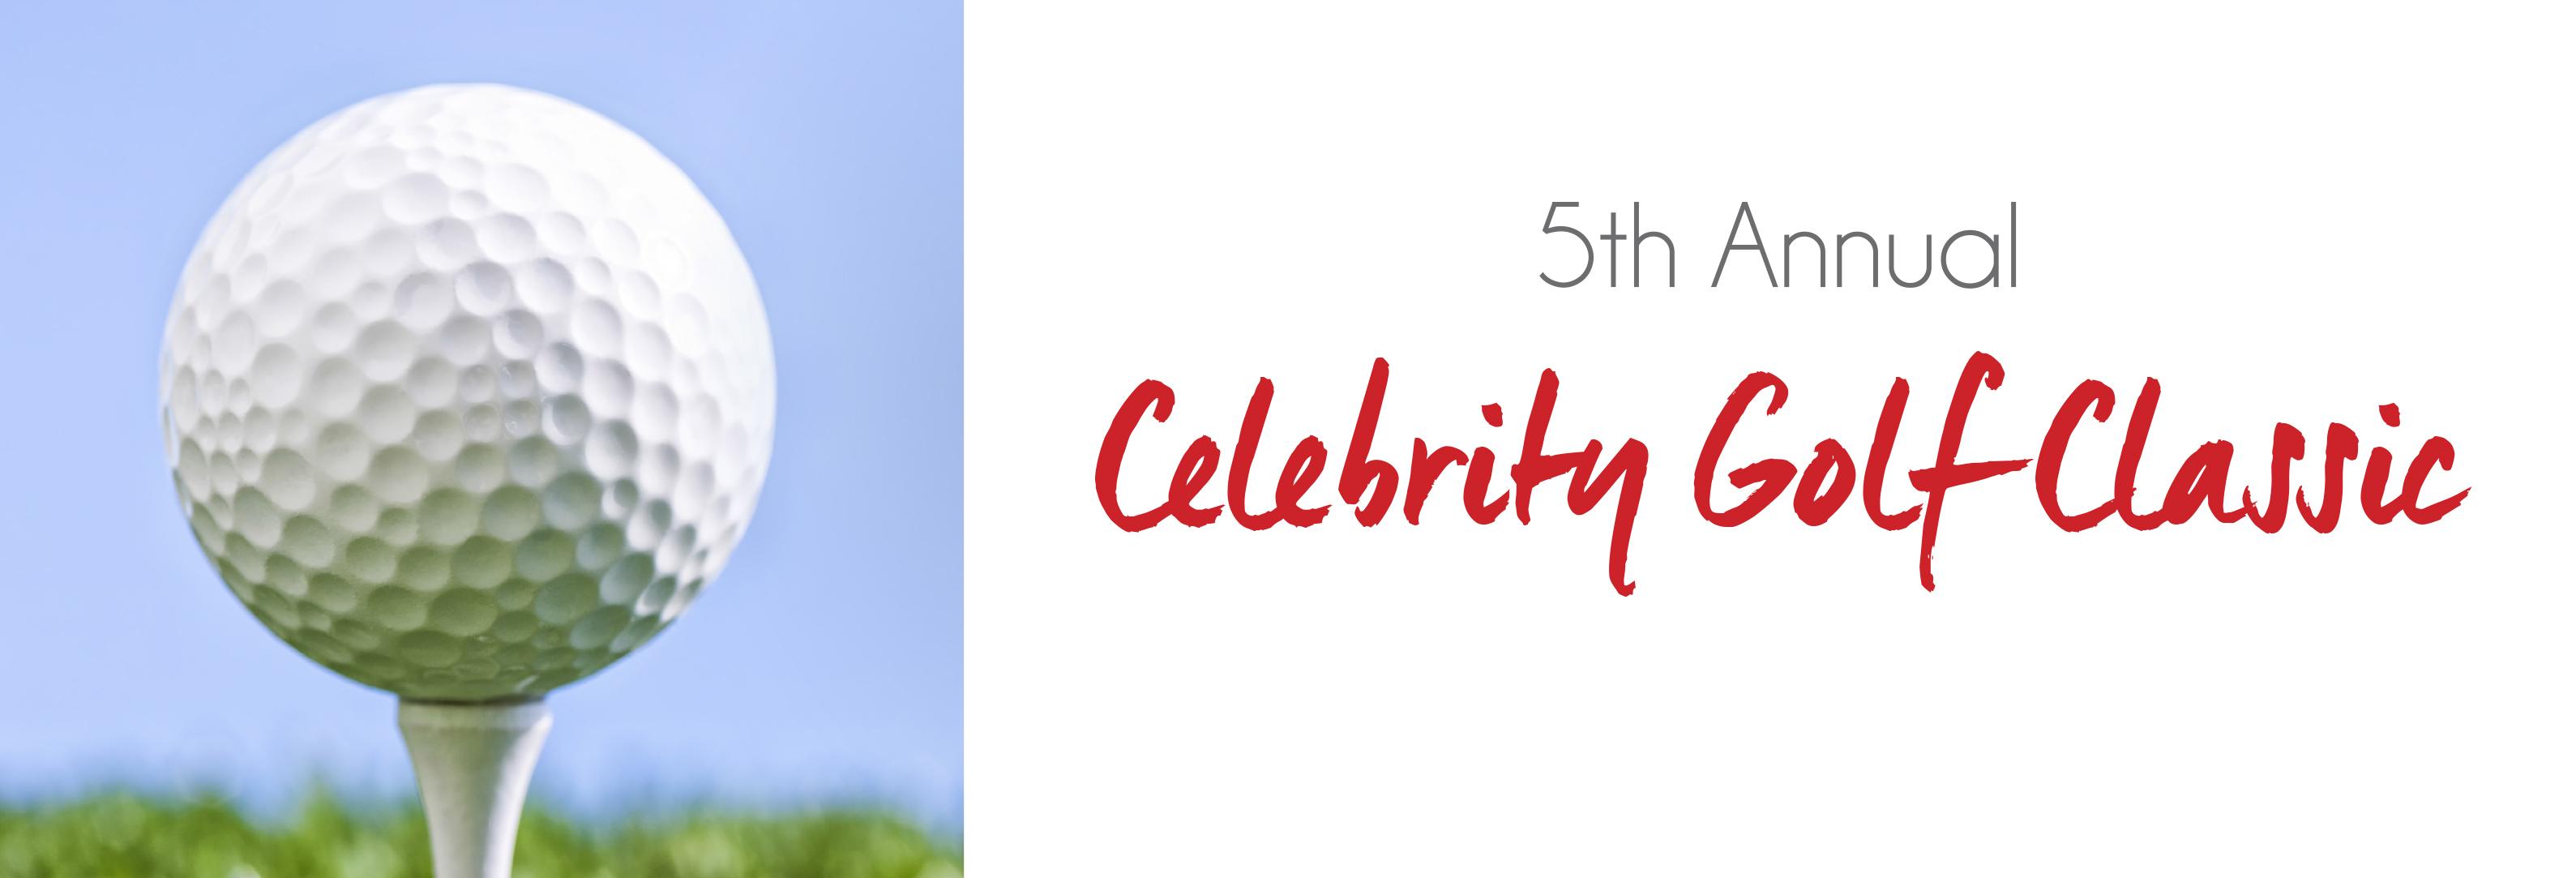 5th Annual Celebrity Golf Classic